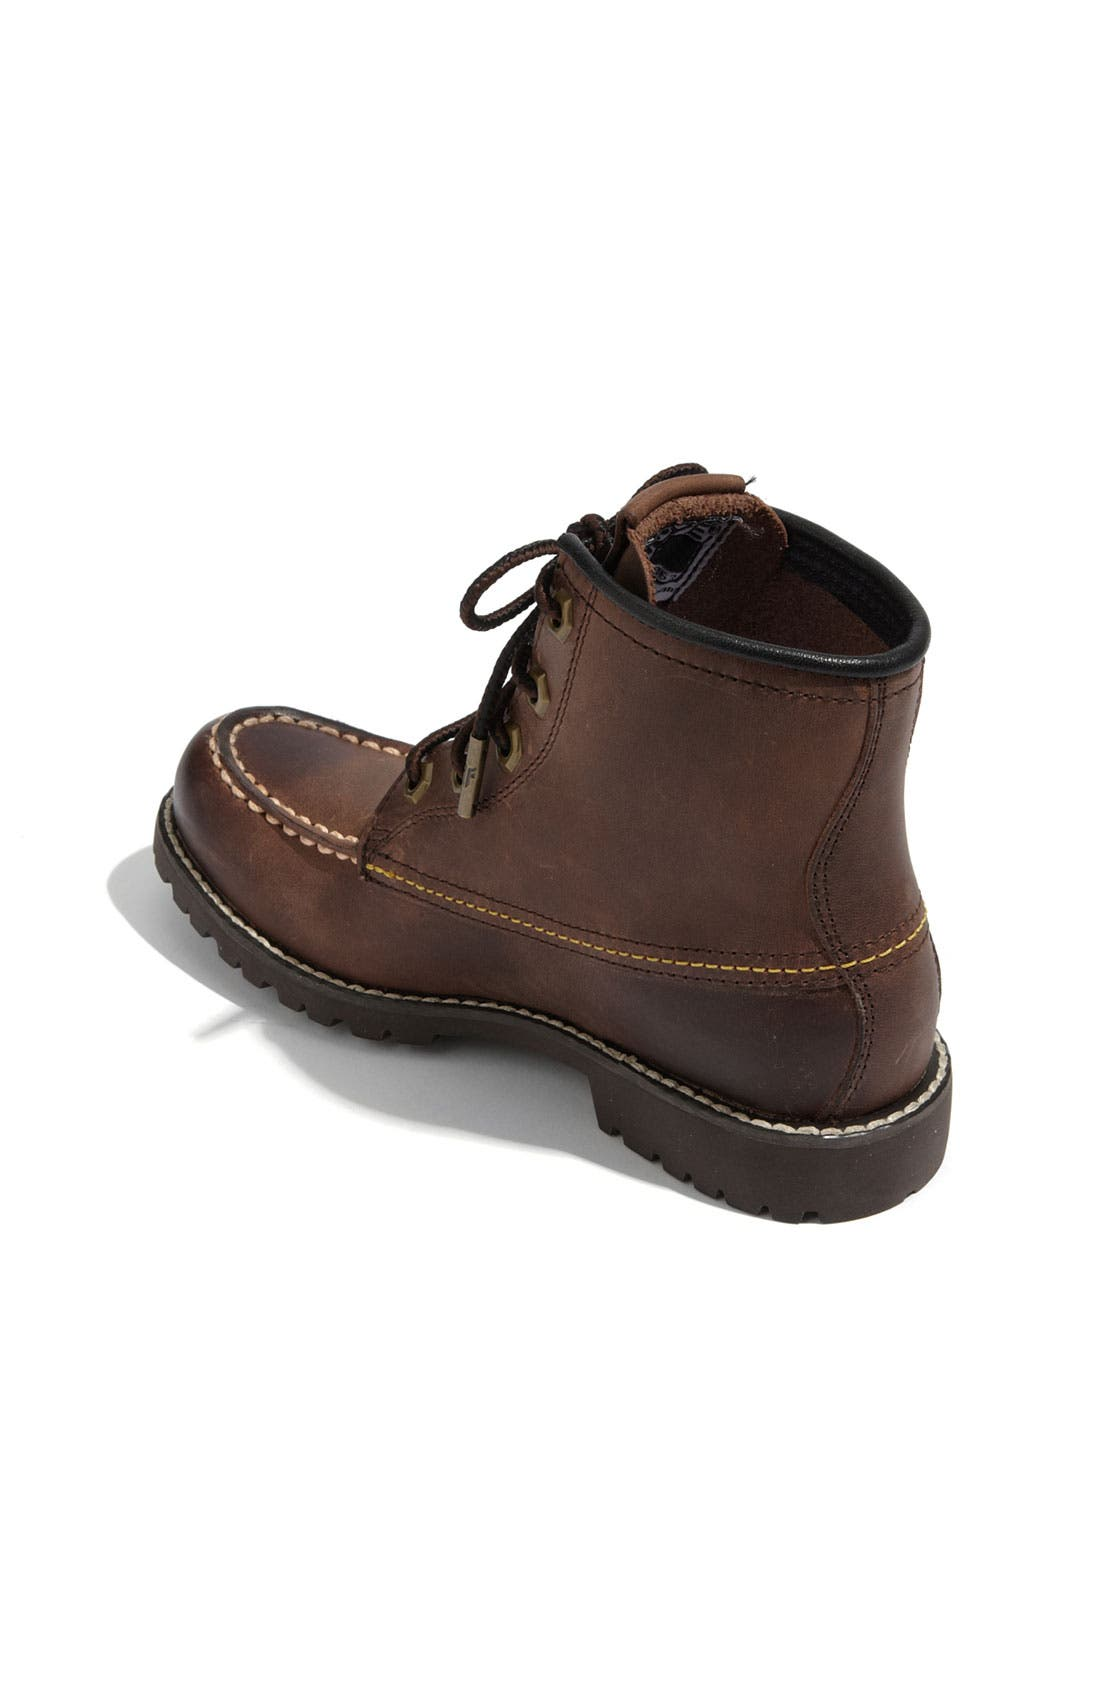 Alternate Image 2  - Frye 'Dakota Mid Lace' Boot (Baby, Walker, Toddler, Little Kid & Big Kid)